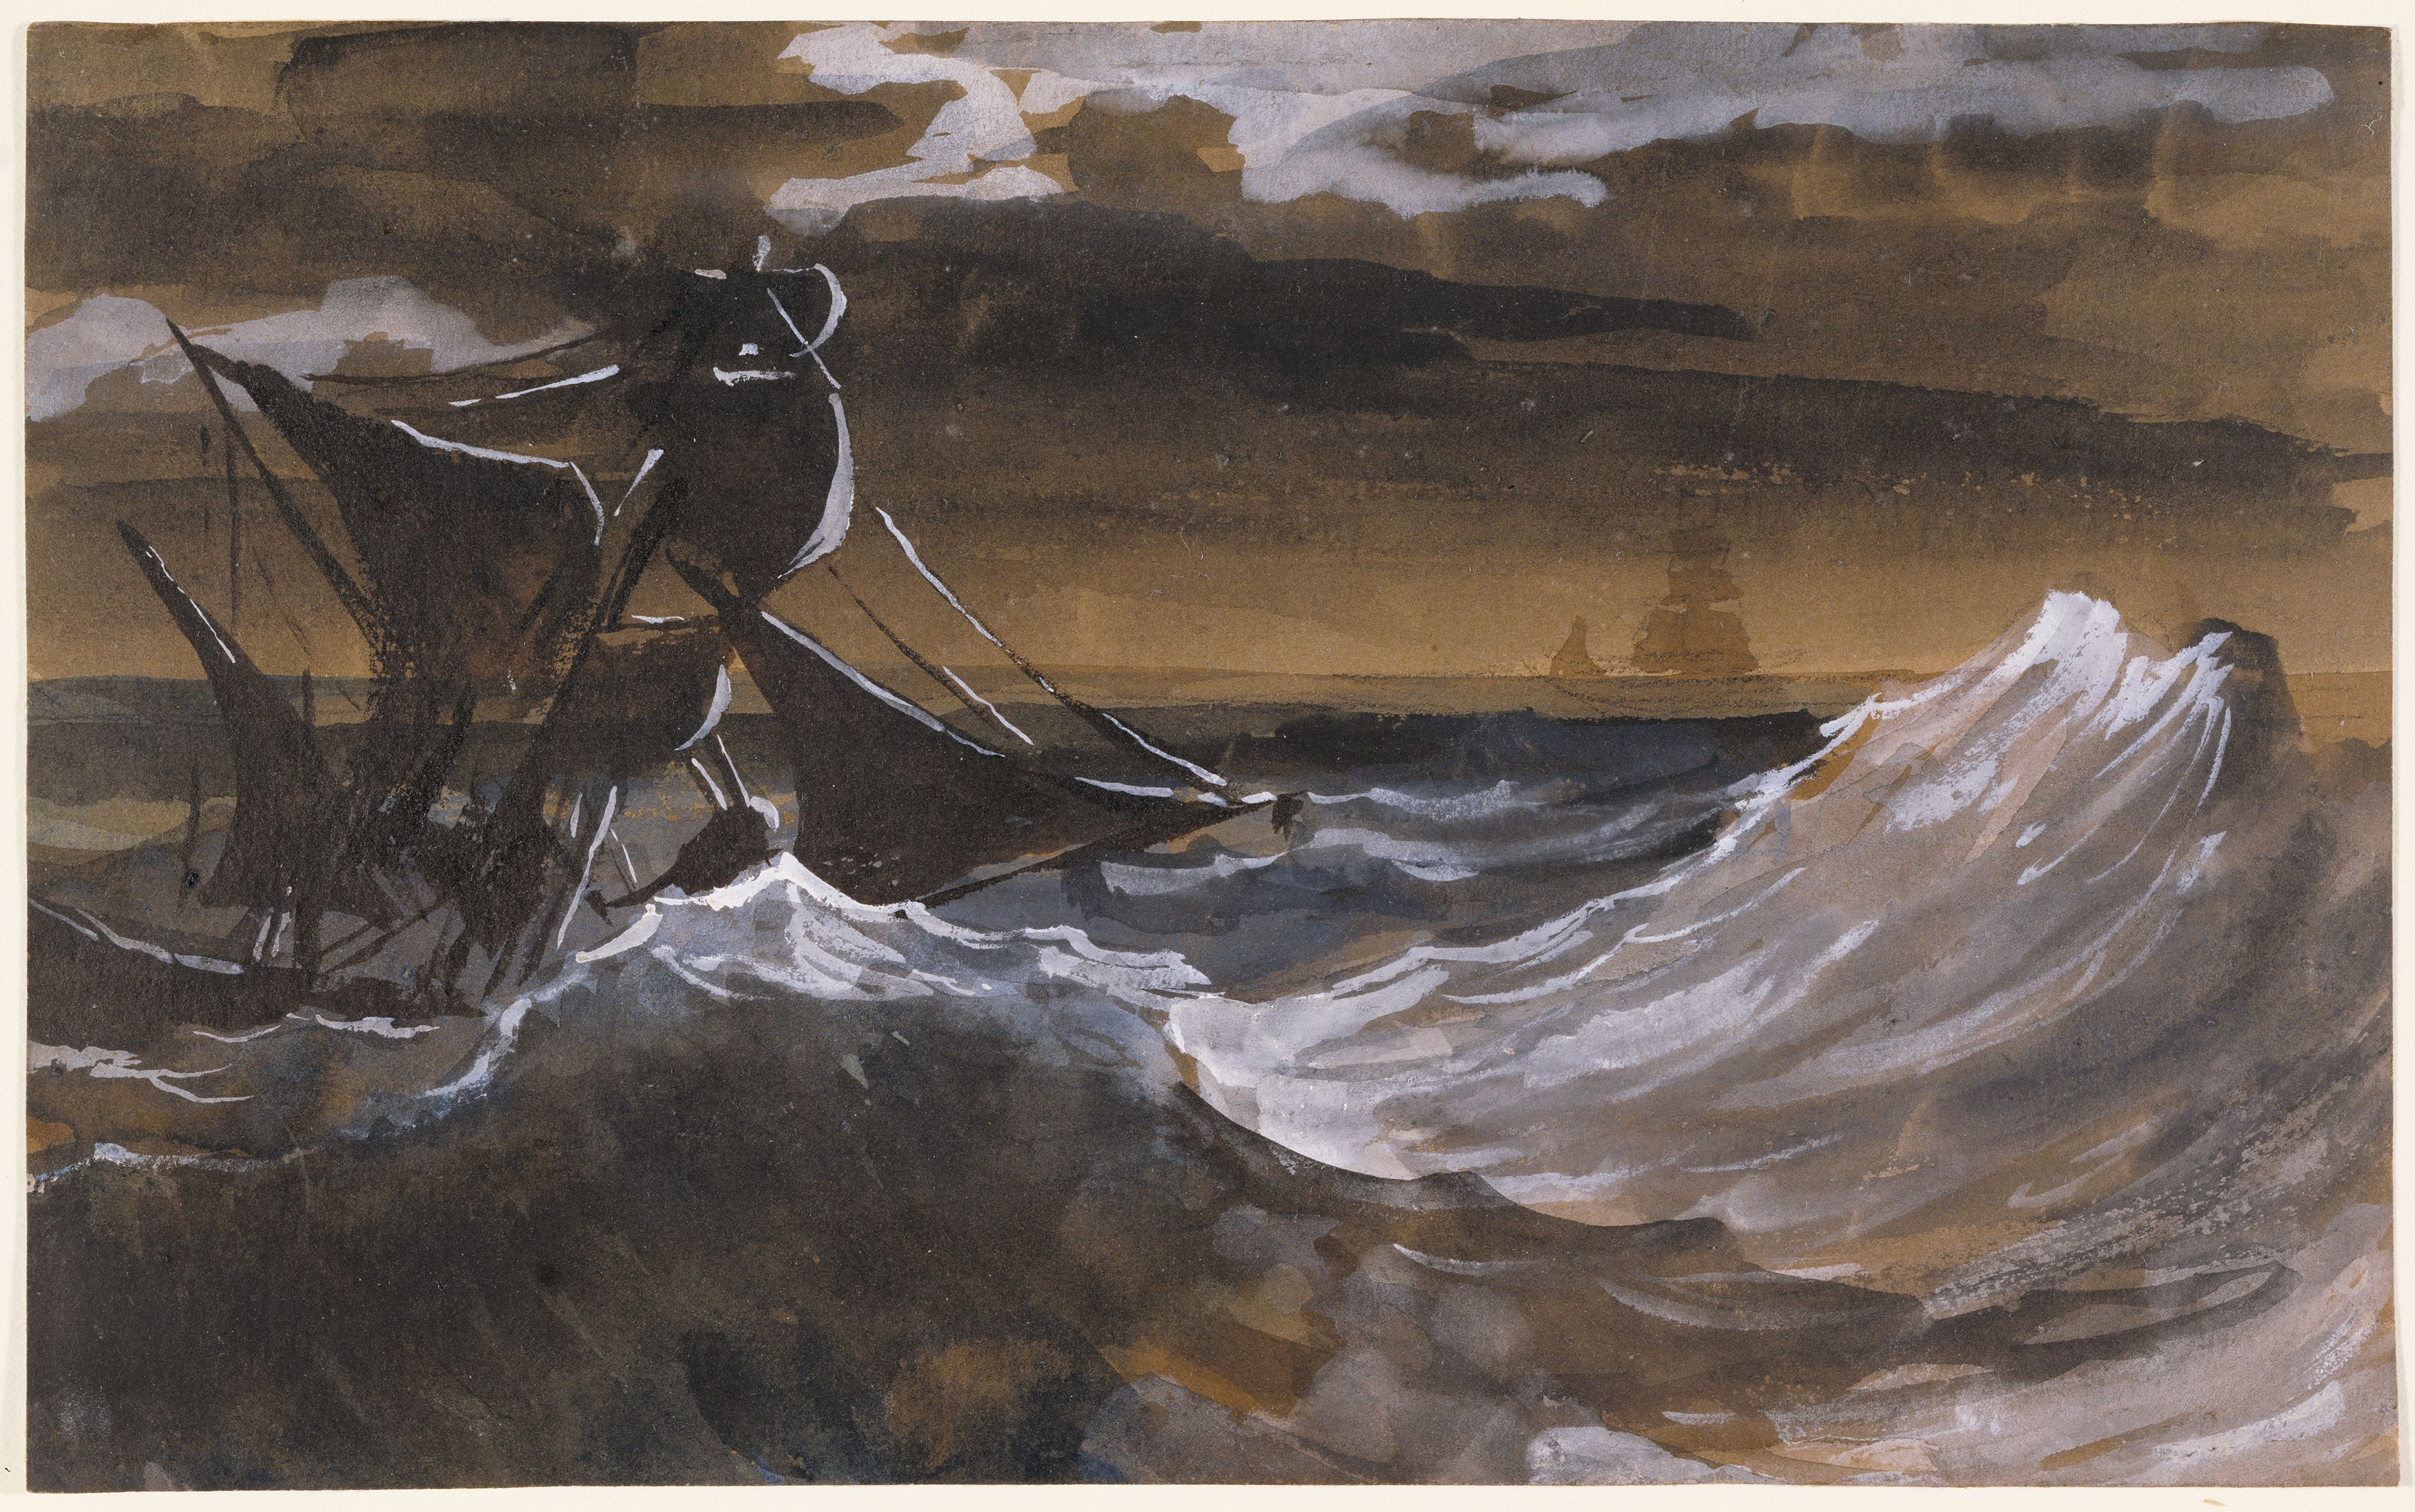 Théodore Géricault, 'Sailboat on the Sea,' 1818-1819, J. Paul Getty Museum